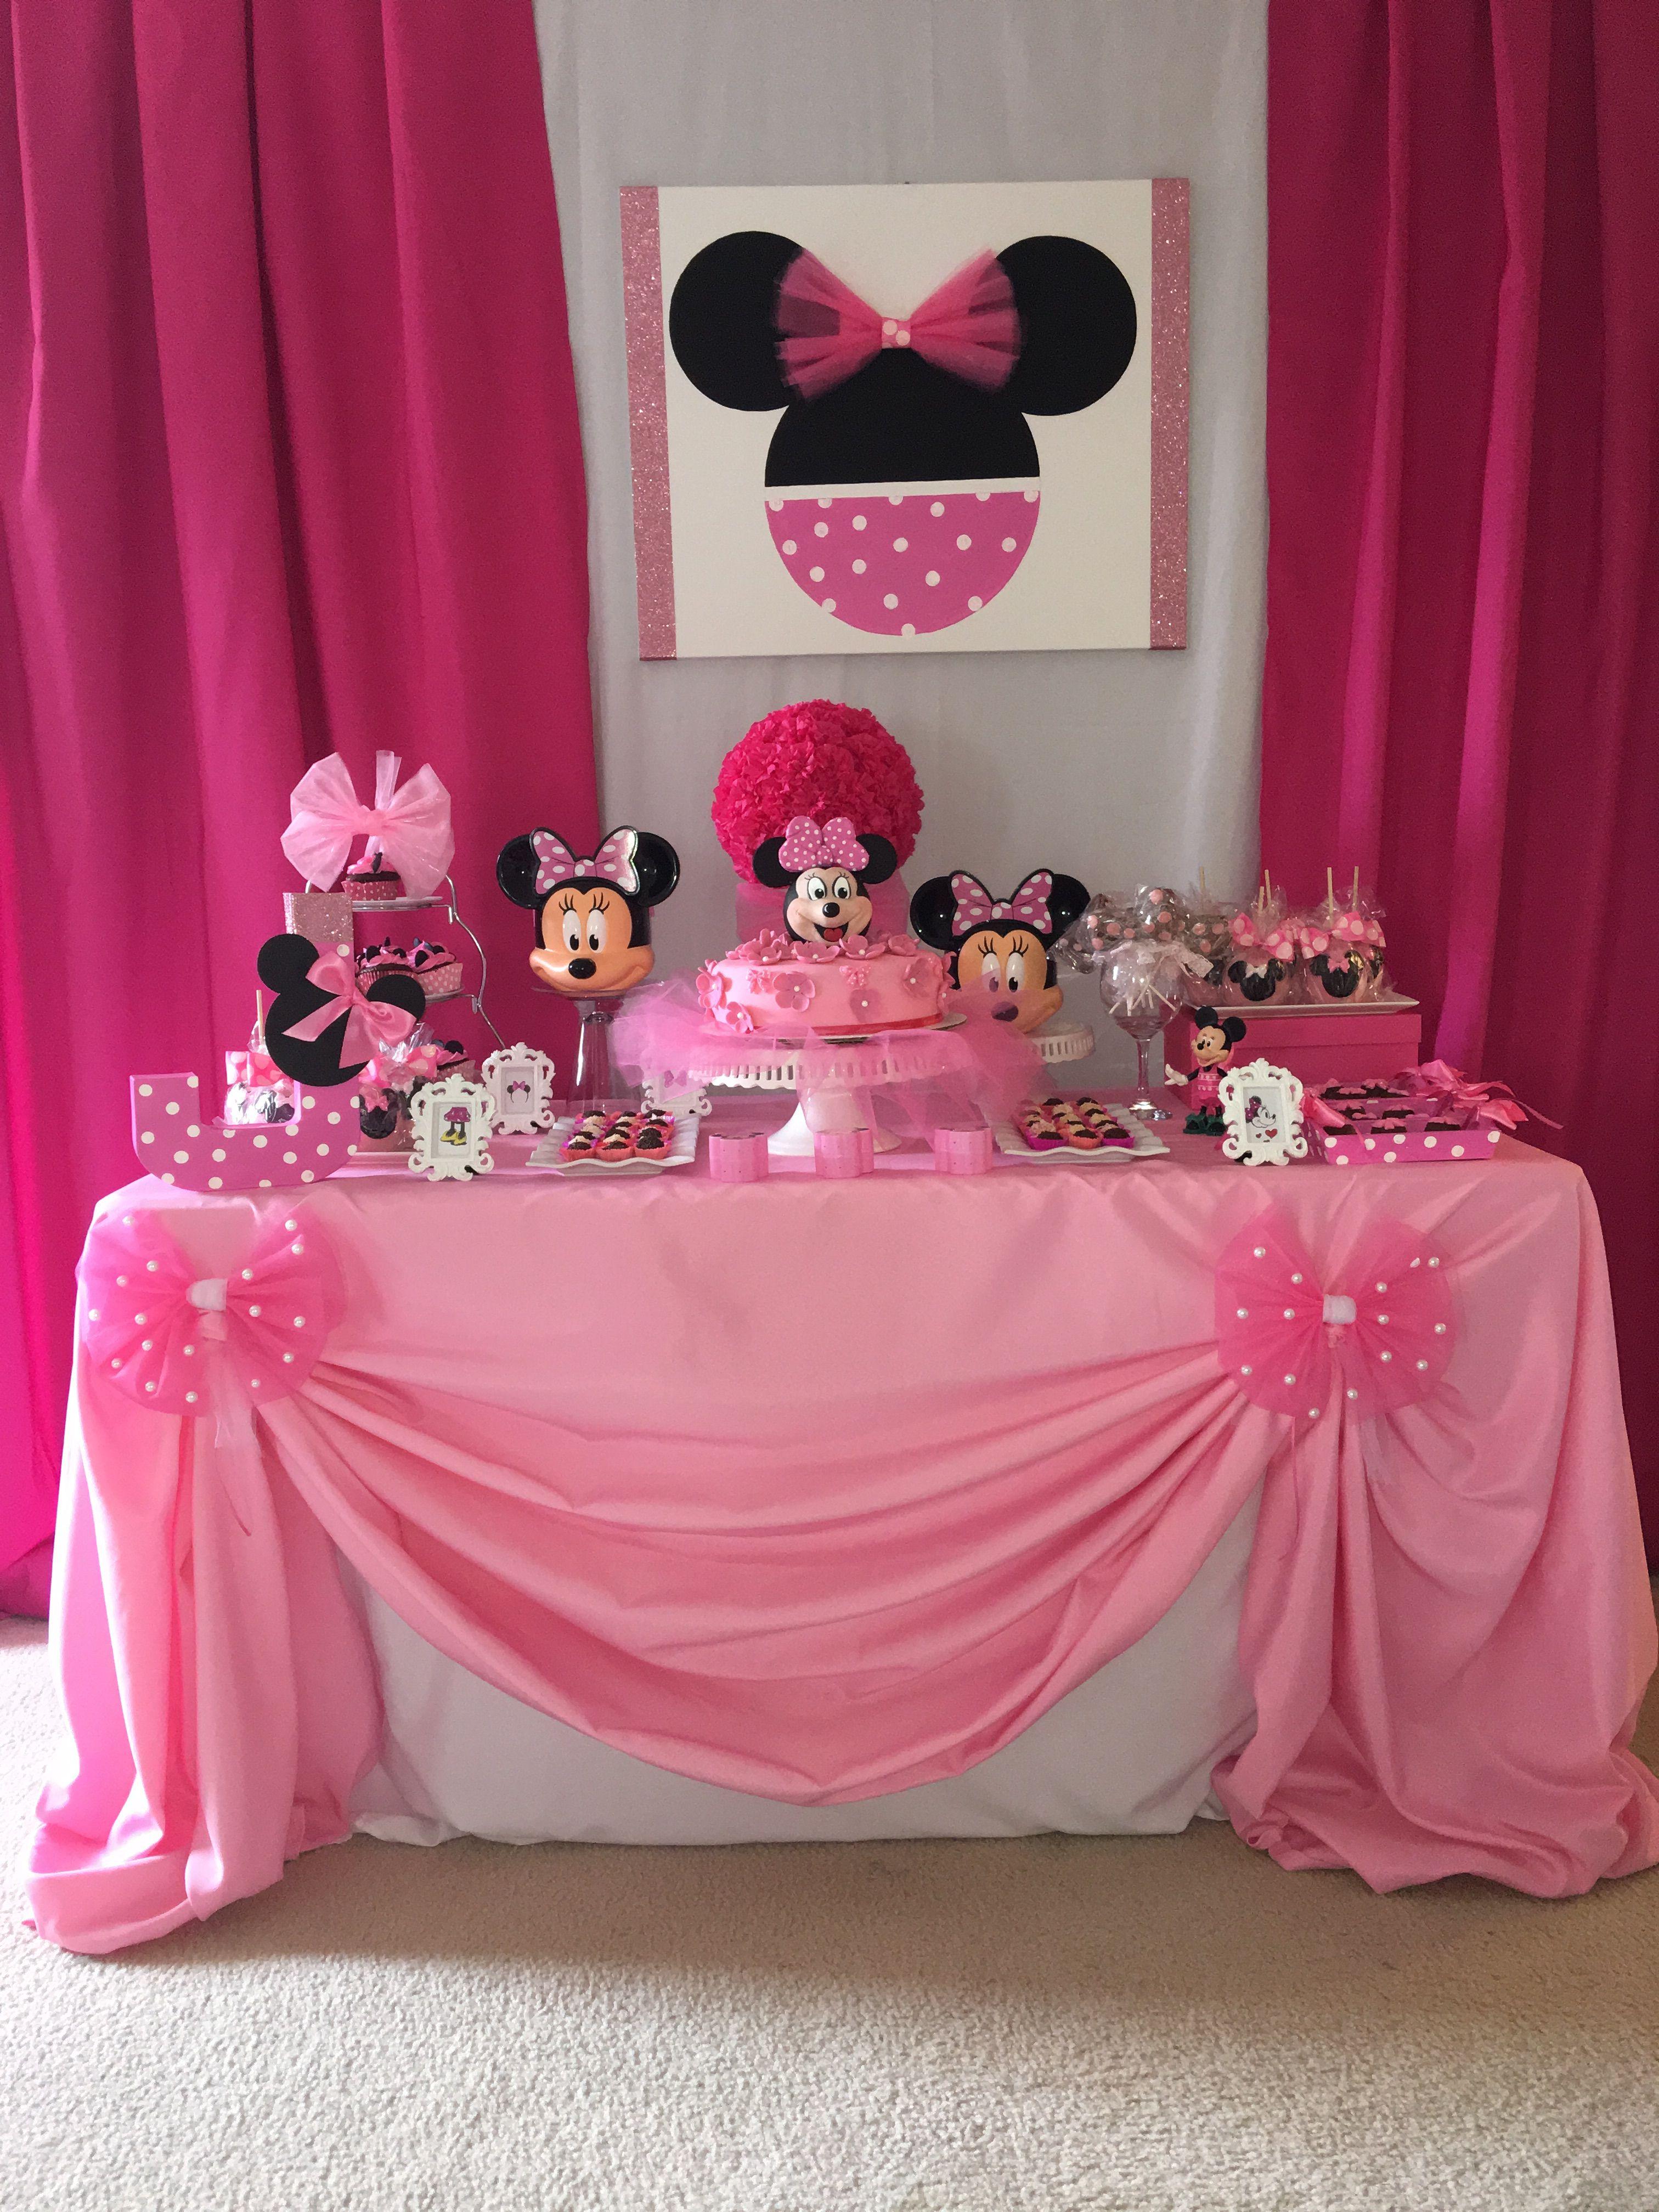 Minnie Party Ideas Minnie Mouse Birthday Decorations Minnie Mouse Birthday Party Decorations Minnie Mouse Decorations